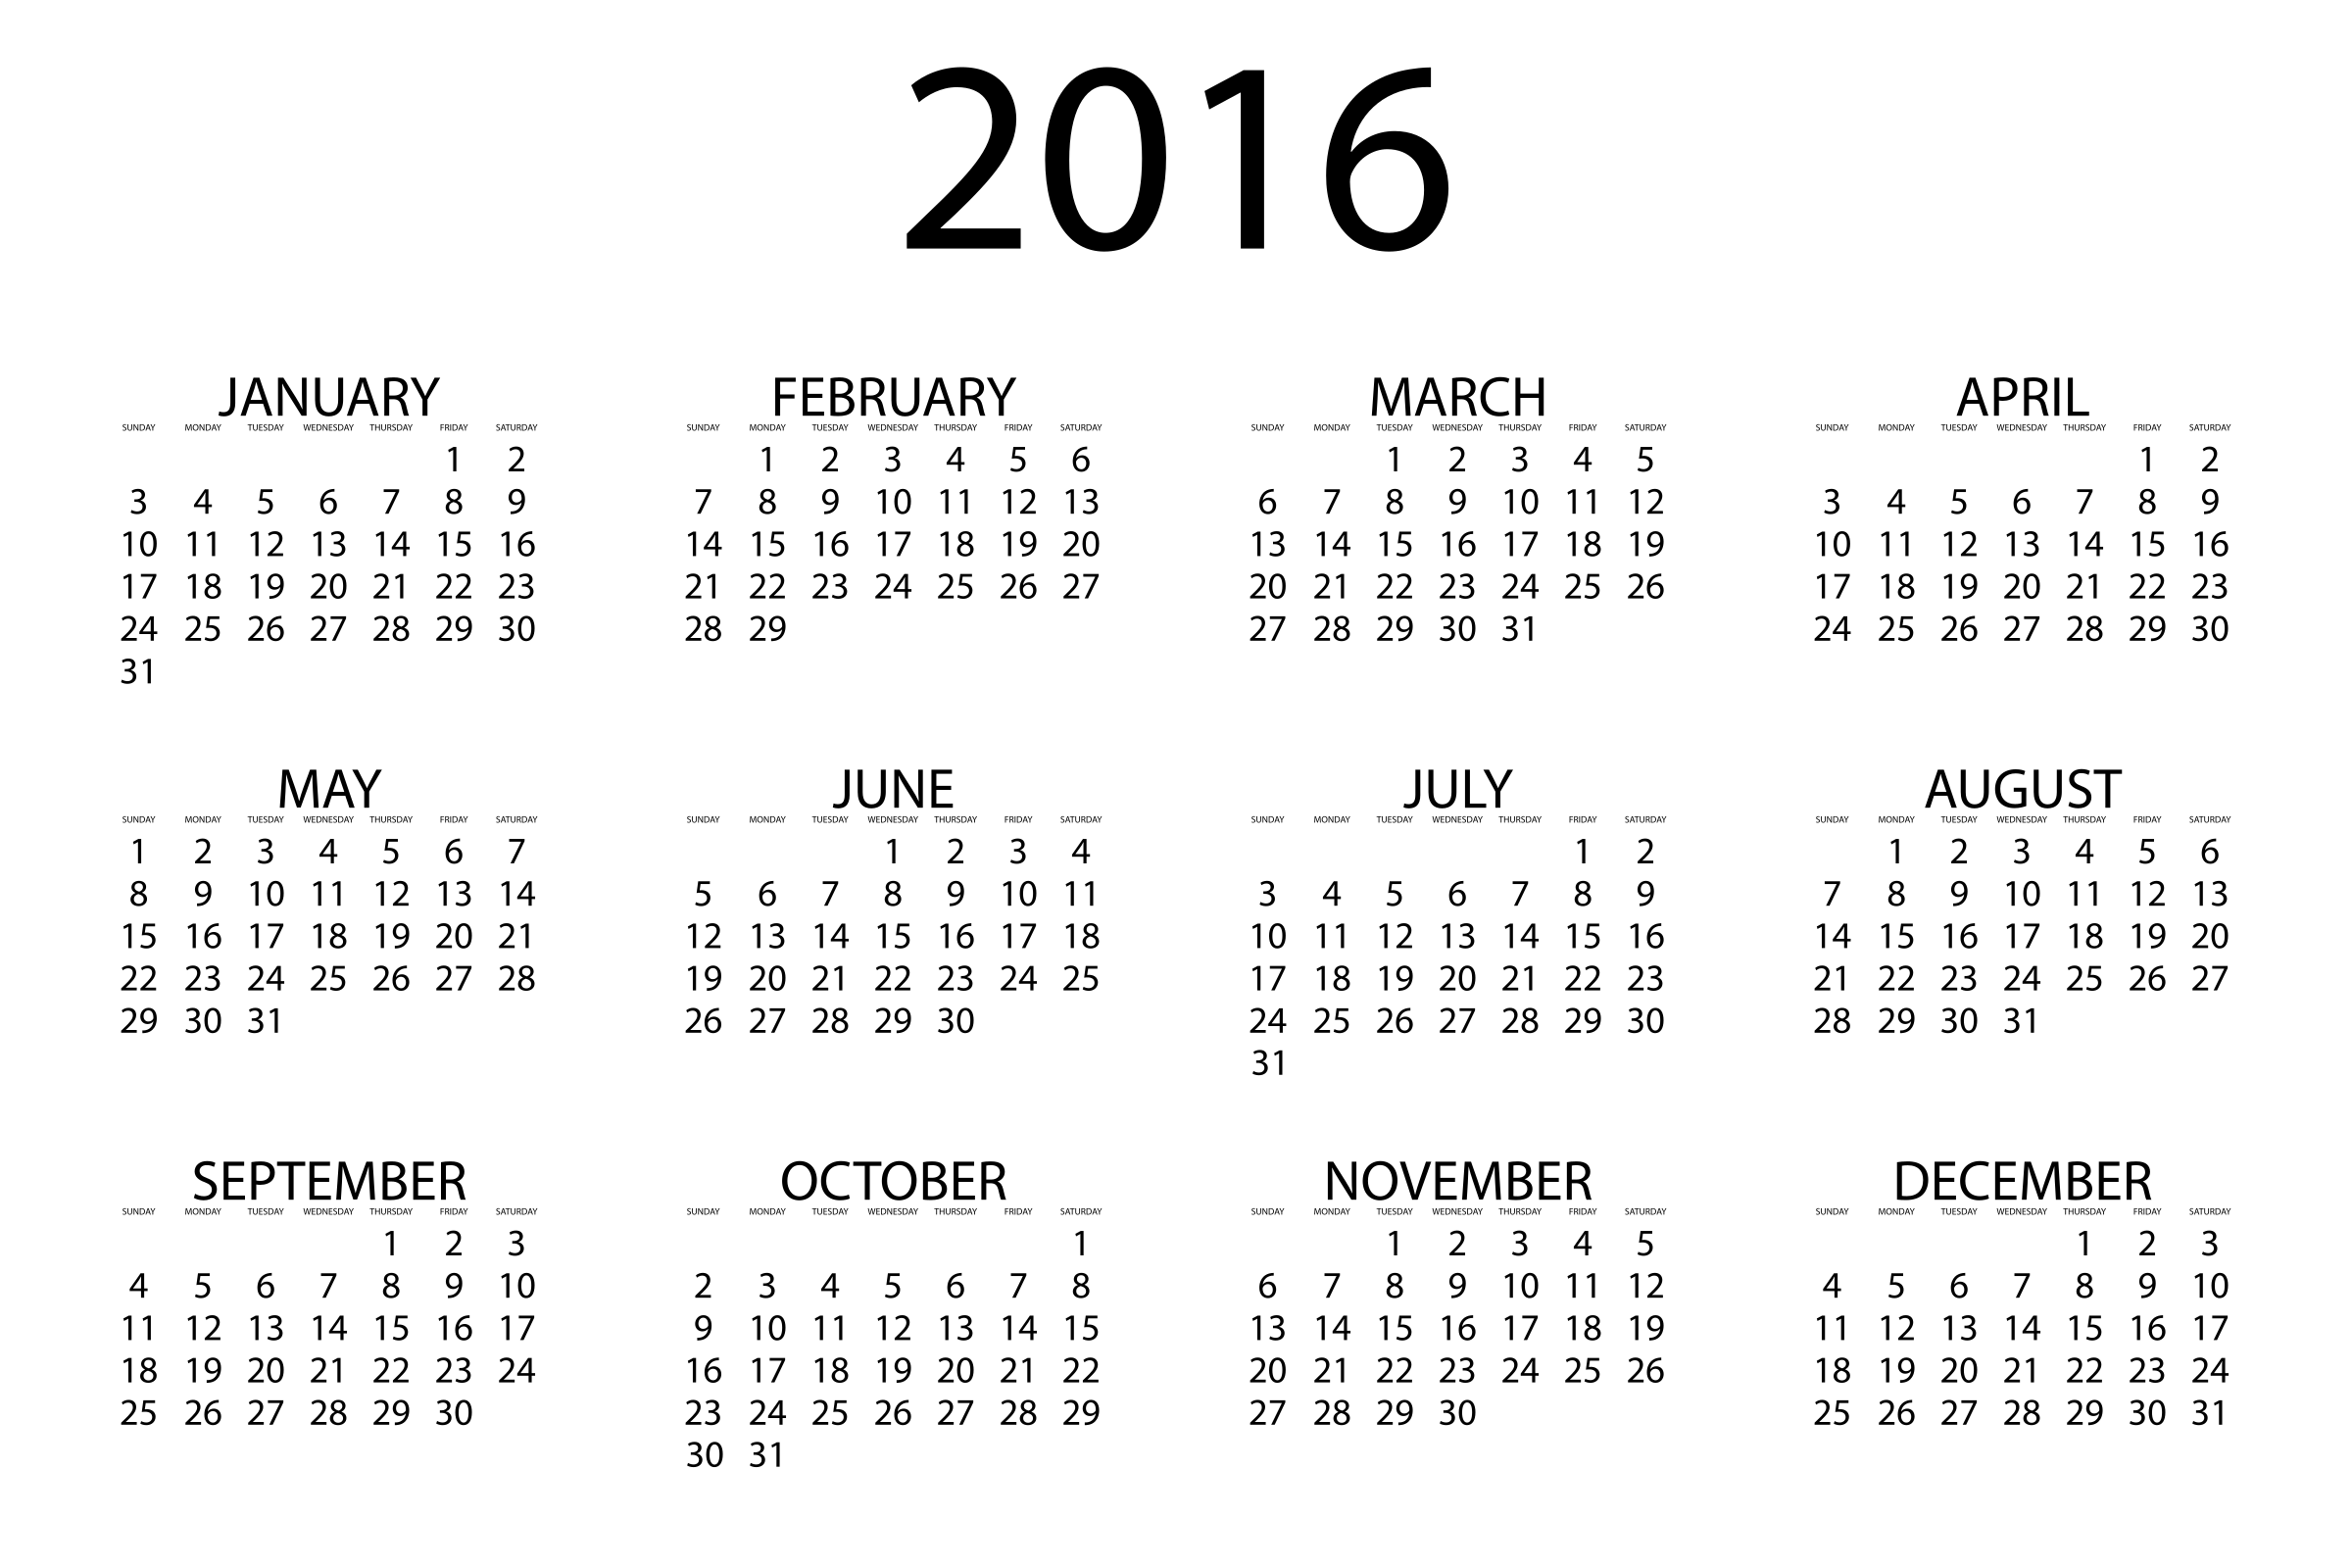 2016 calendar clipart graphic transparent download Clipart - 2016 Calendar graphic transparent download